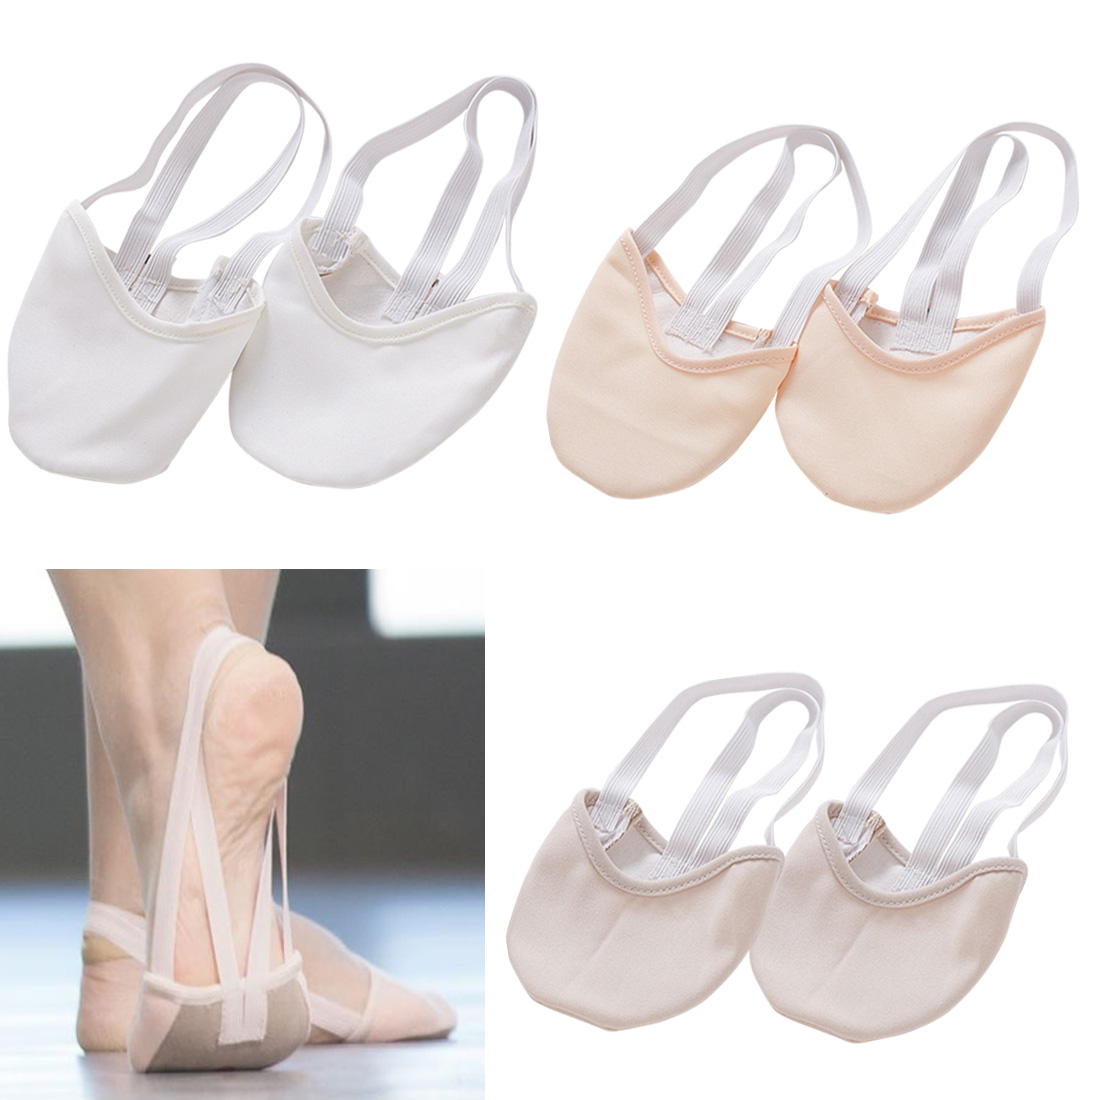 New Half Length Rhythmic Gymnastic Shoes Roupa Ginastica Child Adult Gymnastics Pig Skin Sole Shoes Beige Dancing Dance